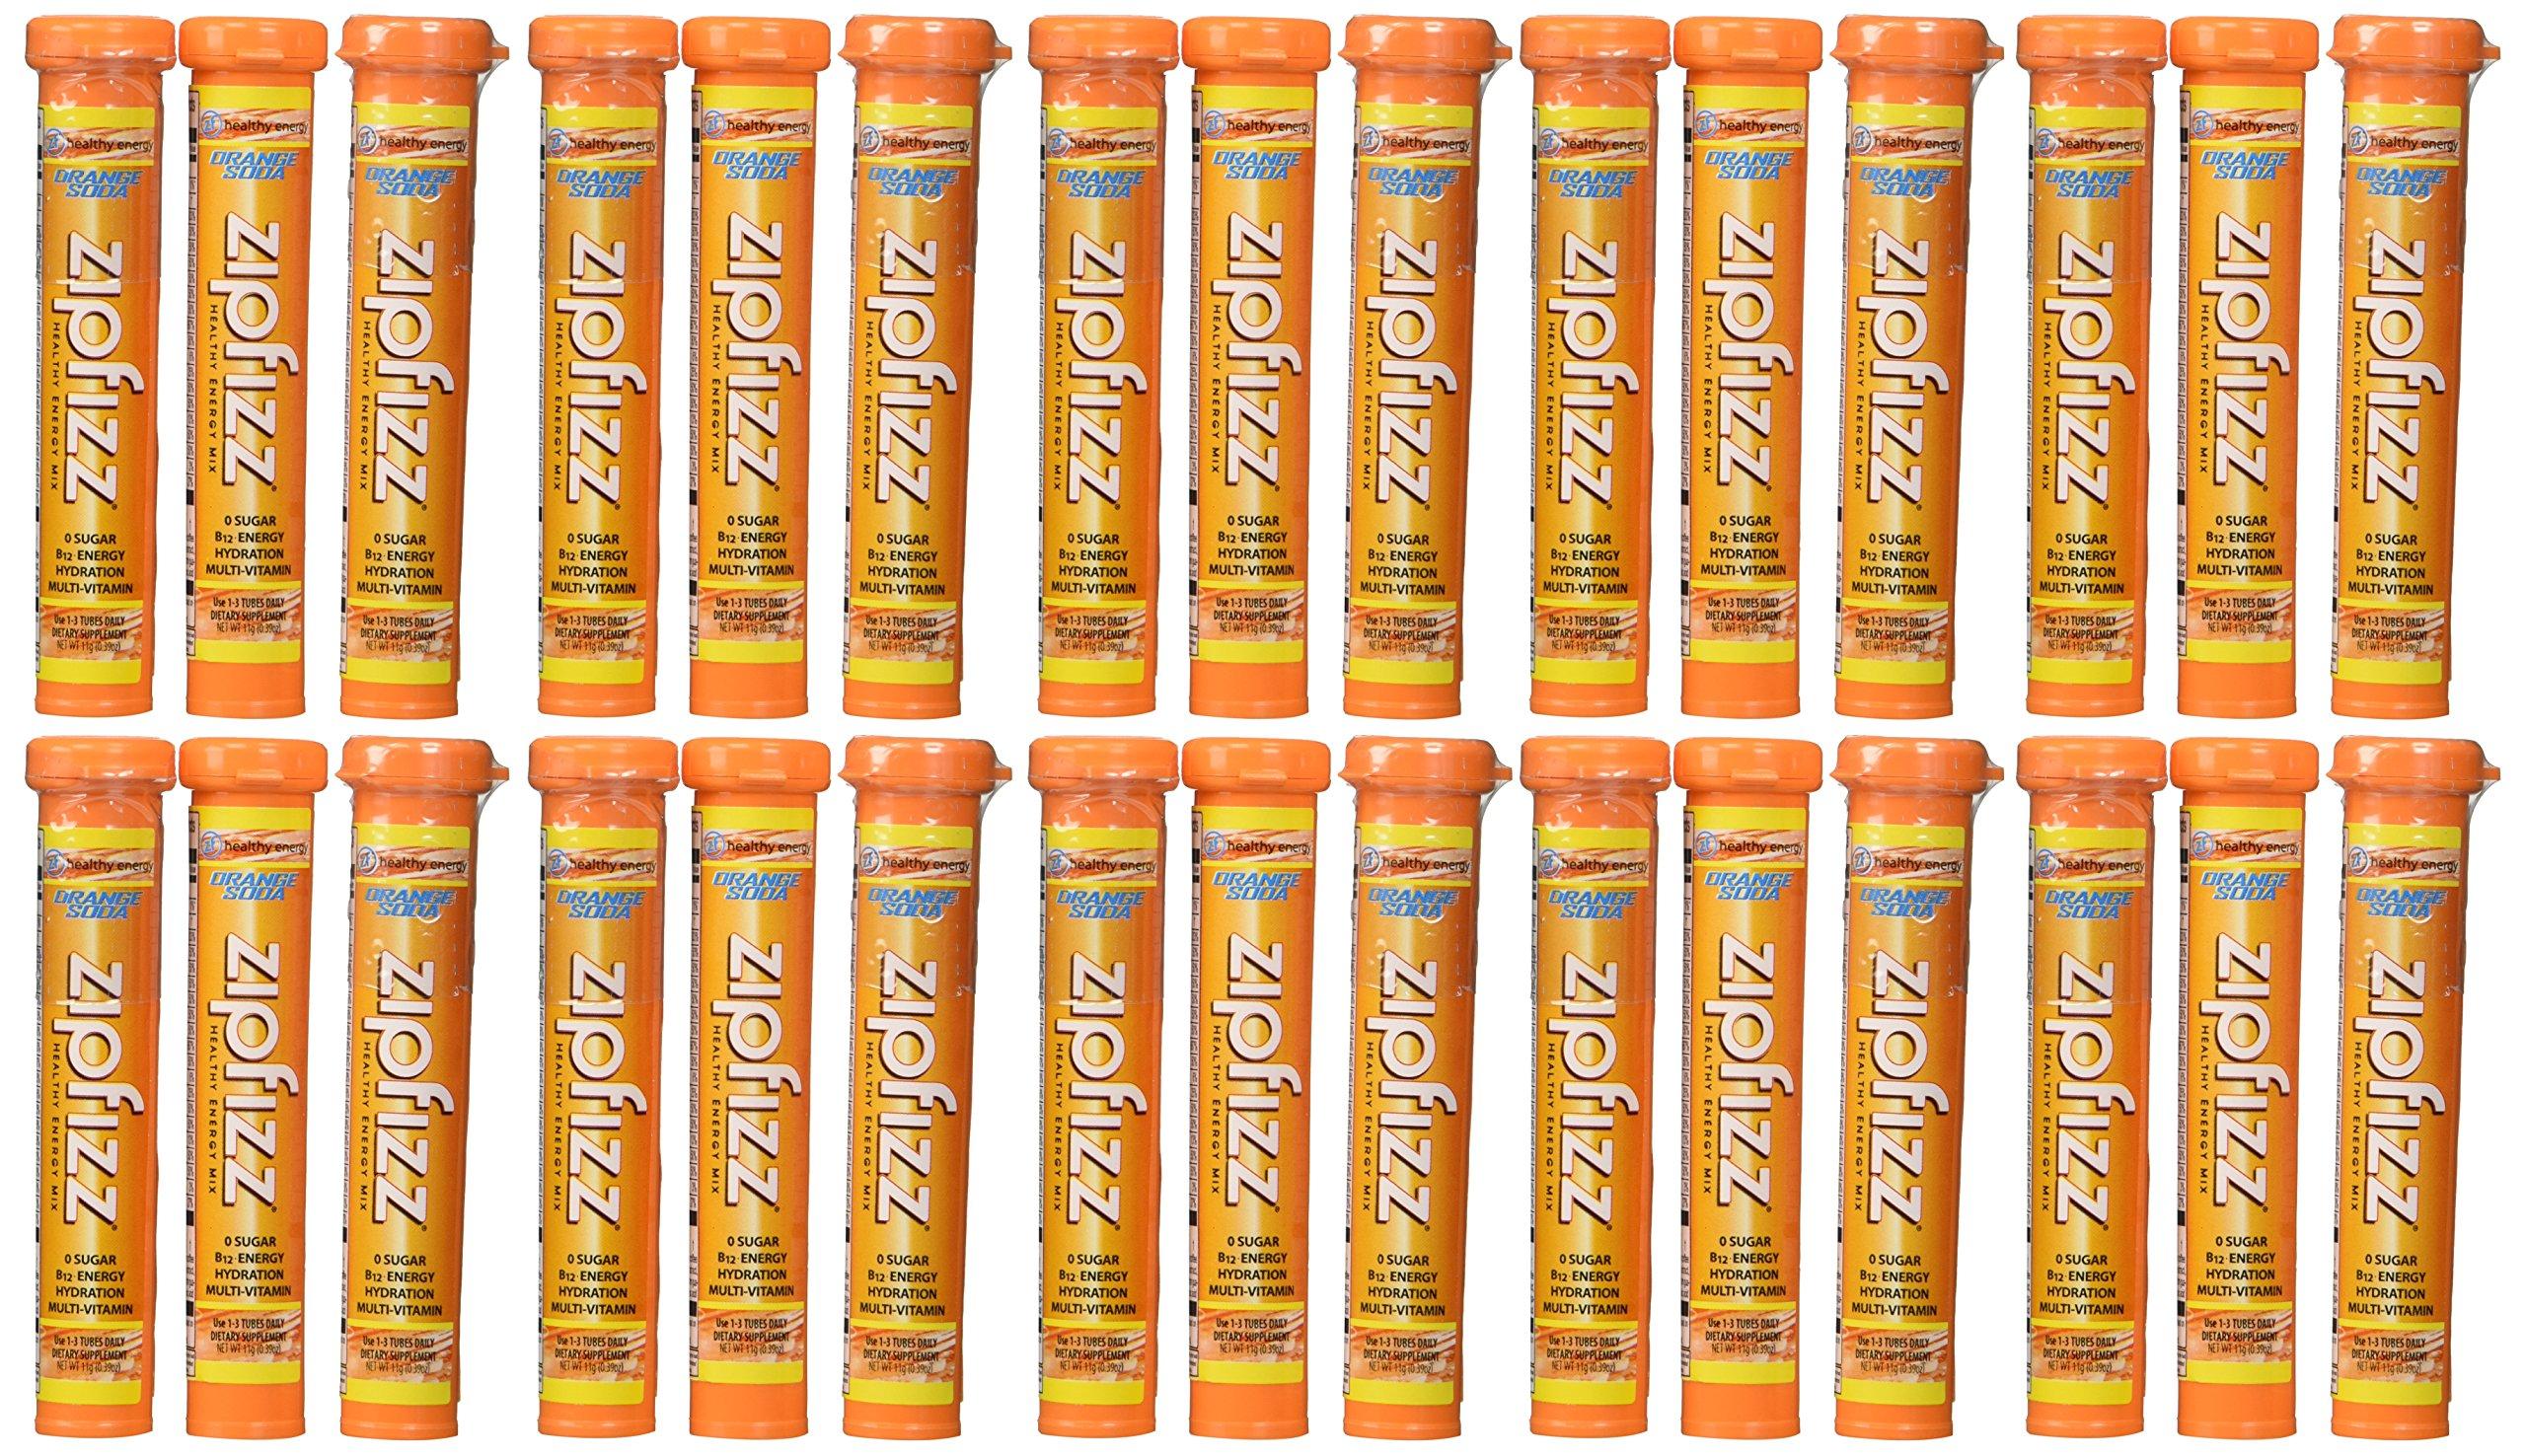 Zipfizz Orange Soda Healthy Energy Drink Mix - Transform Your Water Into a Healthy Energy Drink - 30 Orange Soda Tubes